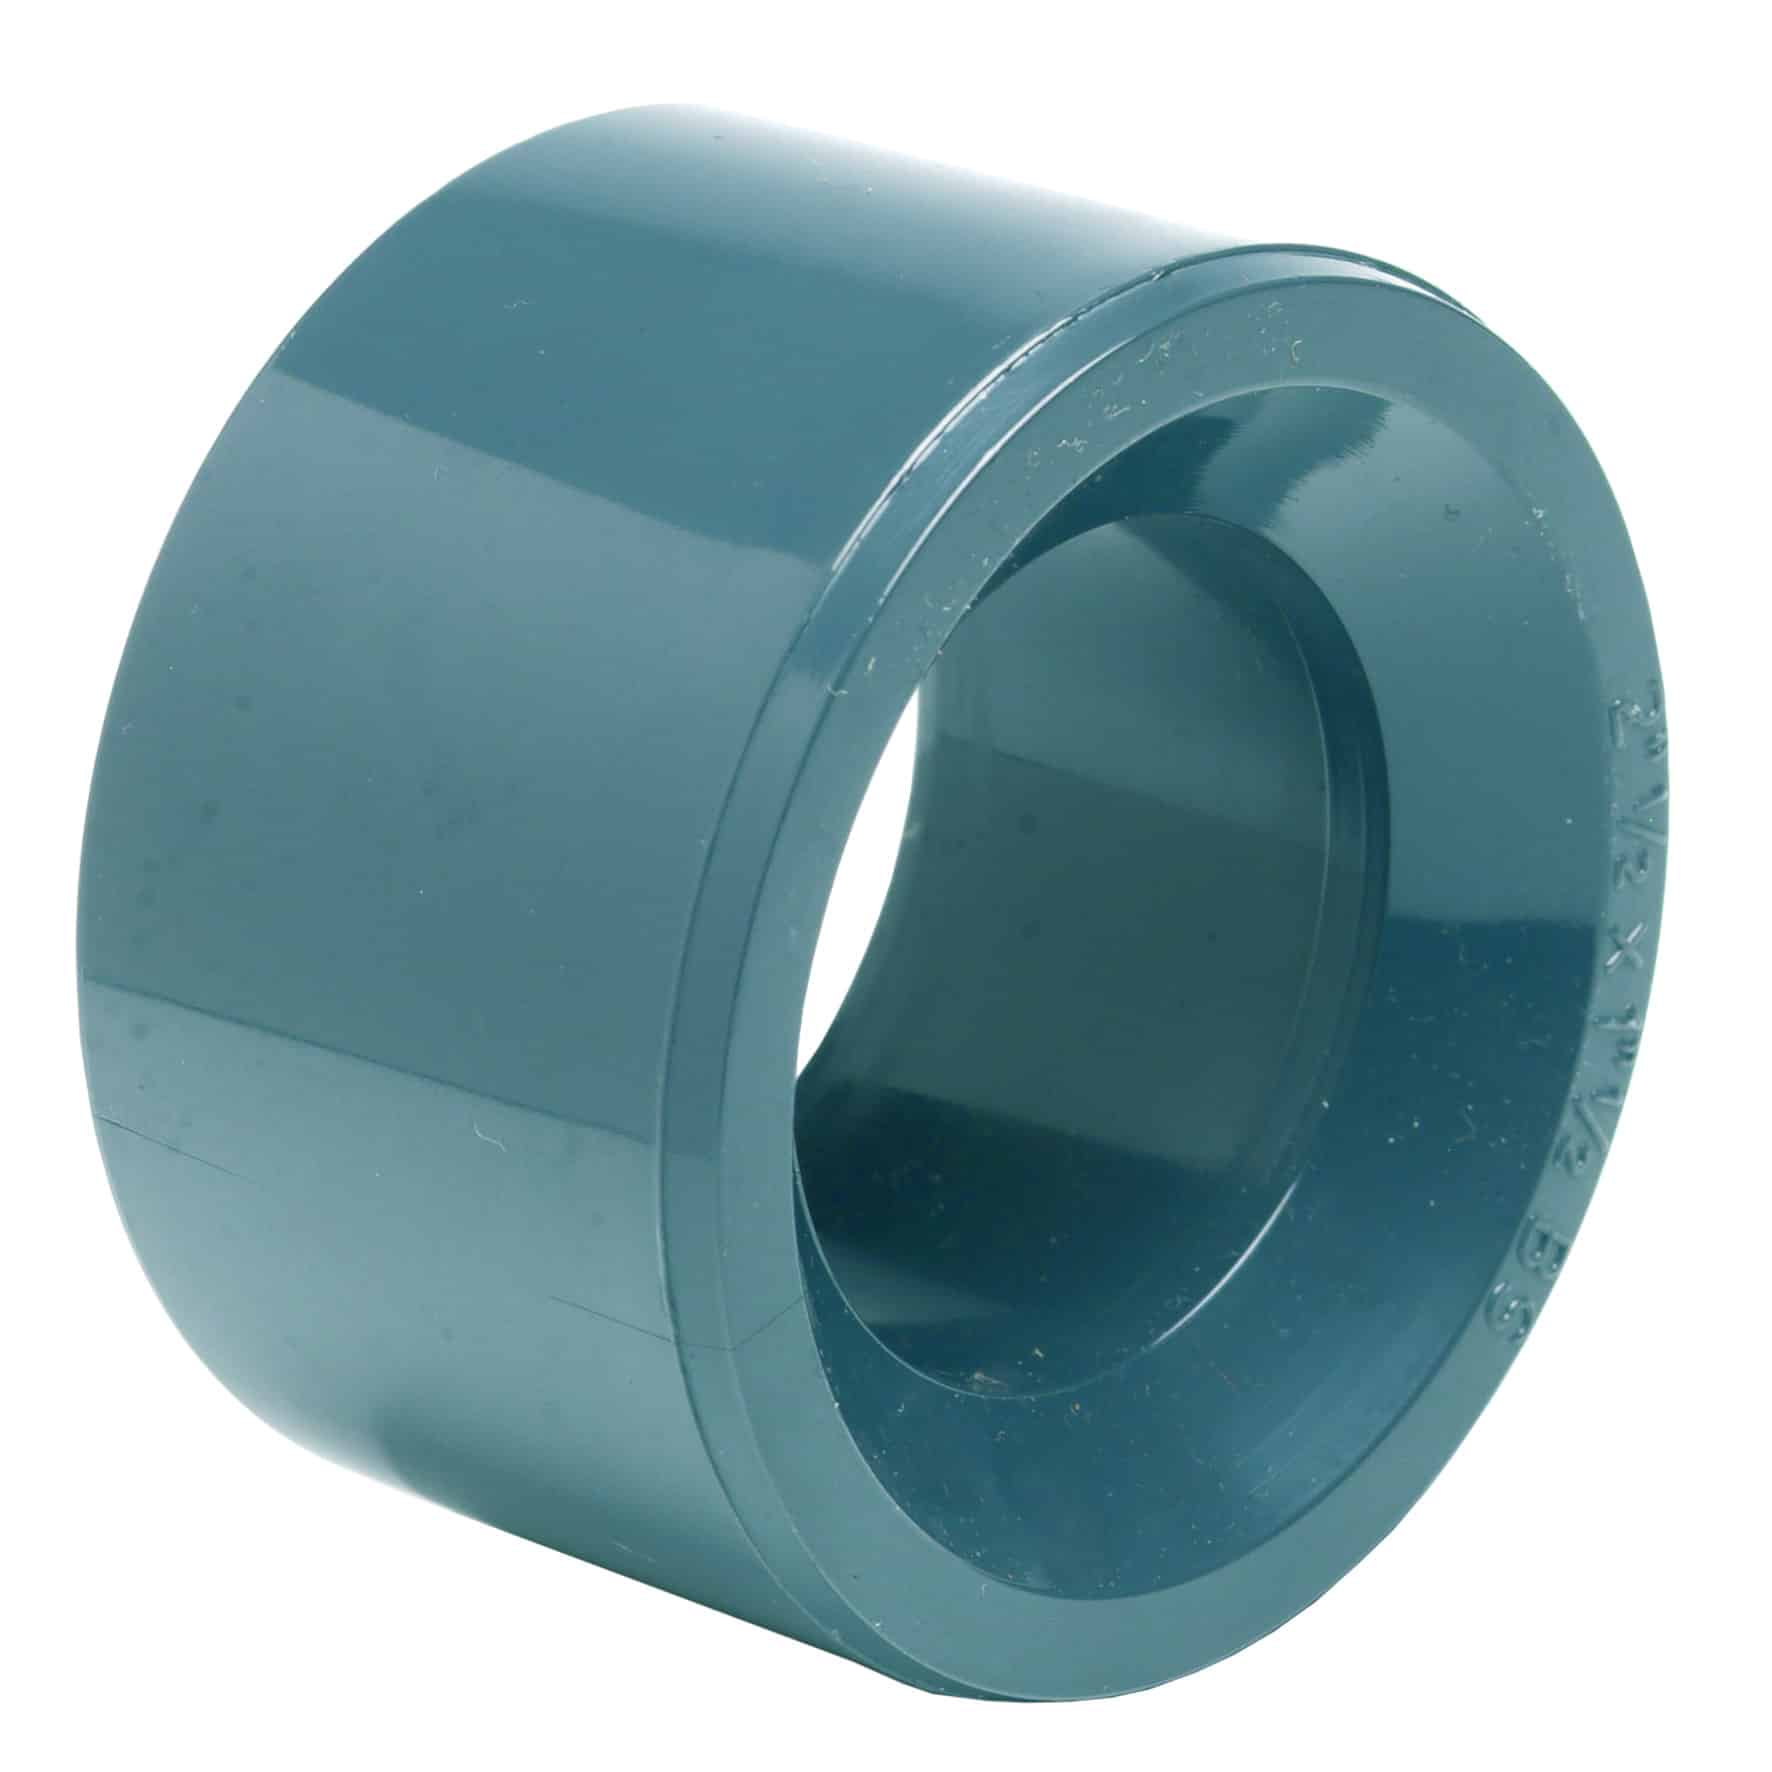 PVC-U reducing bush male - female - EFFAST - 100% Made in Italy